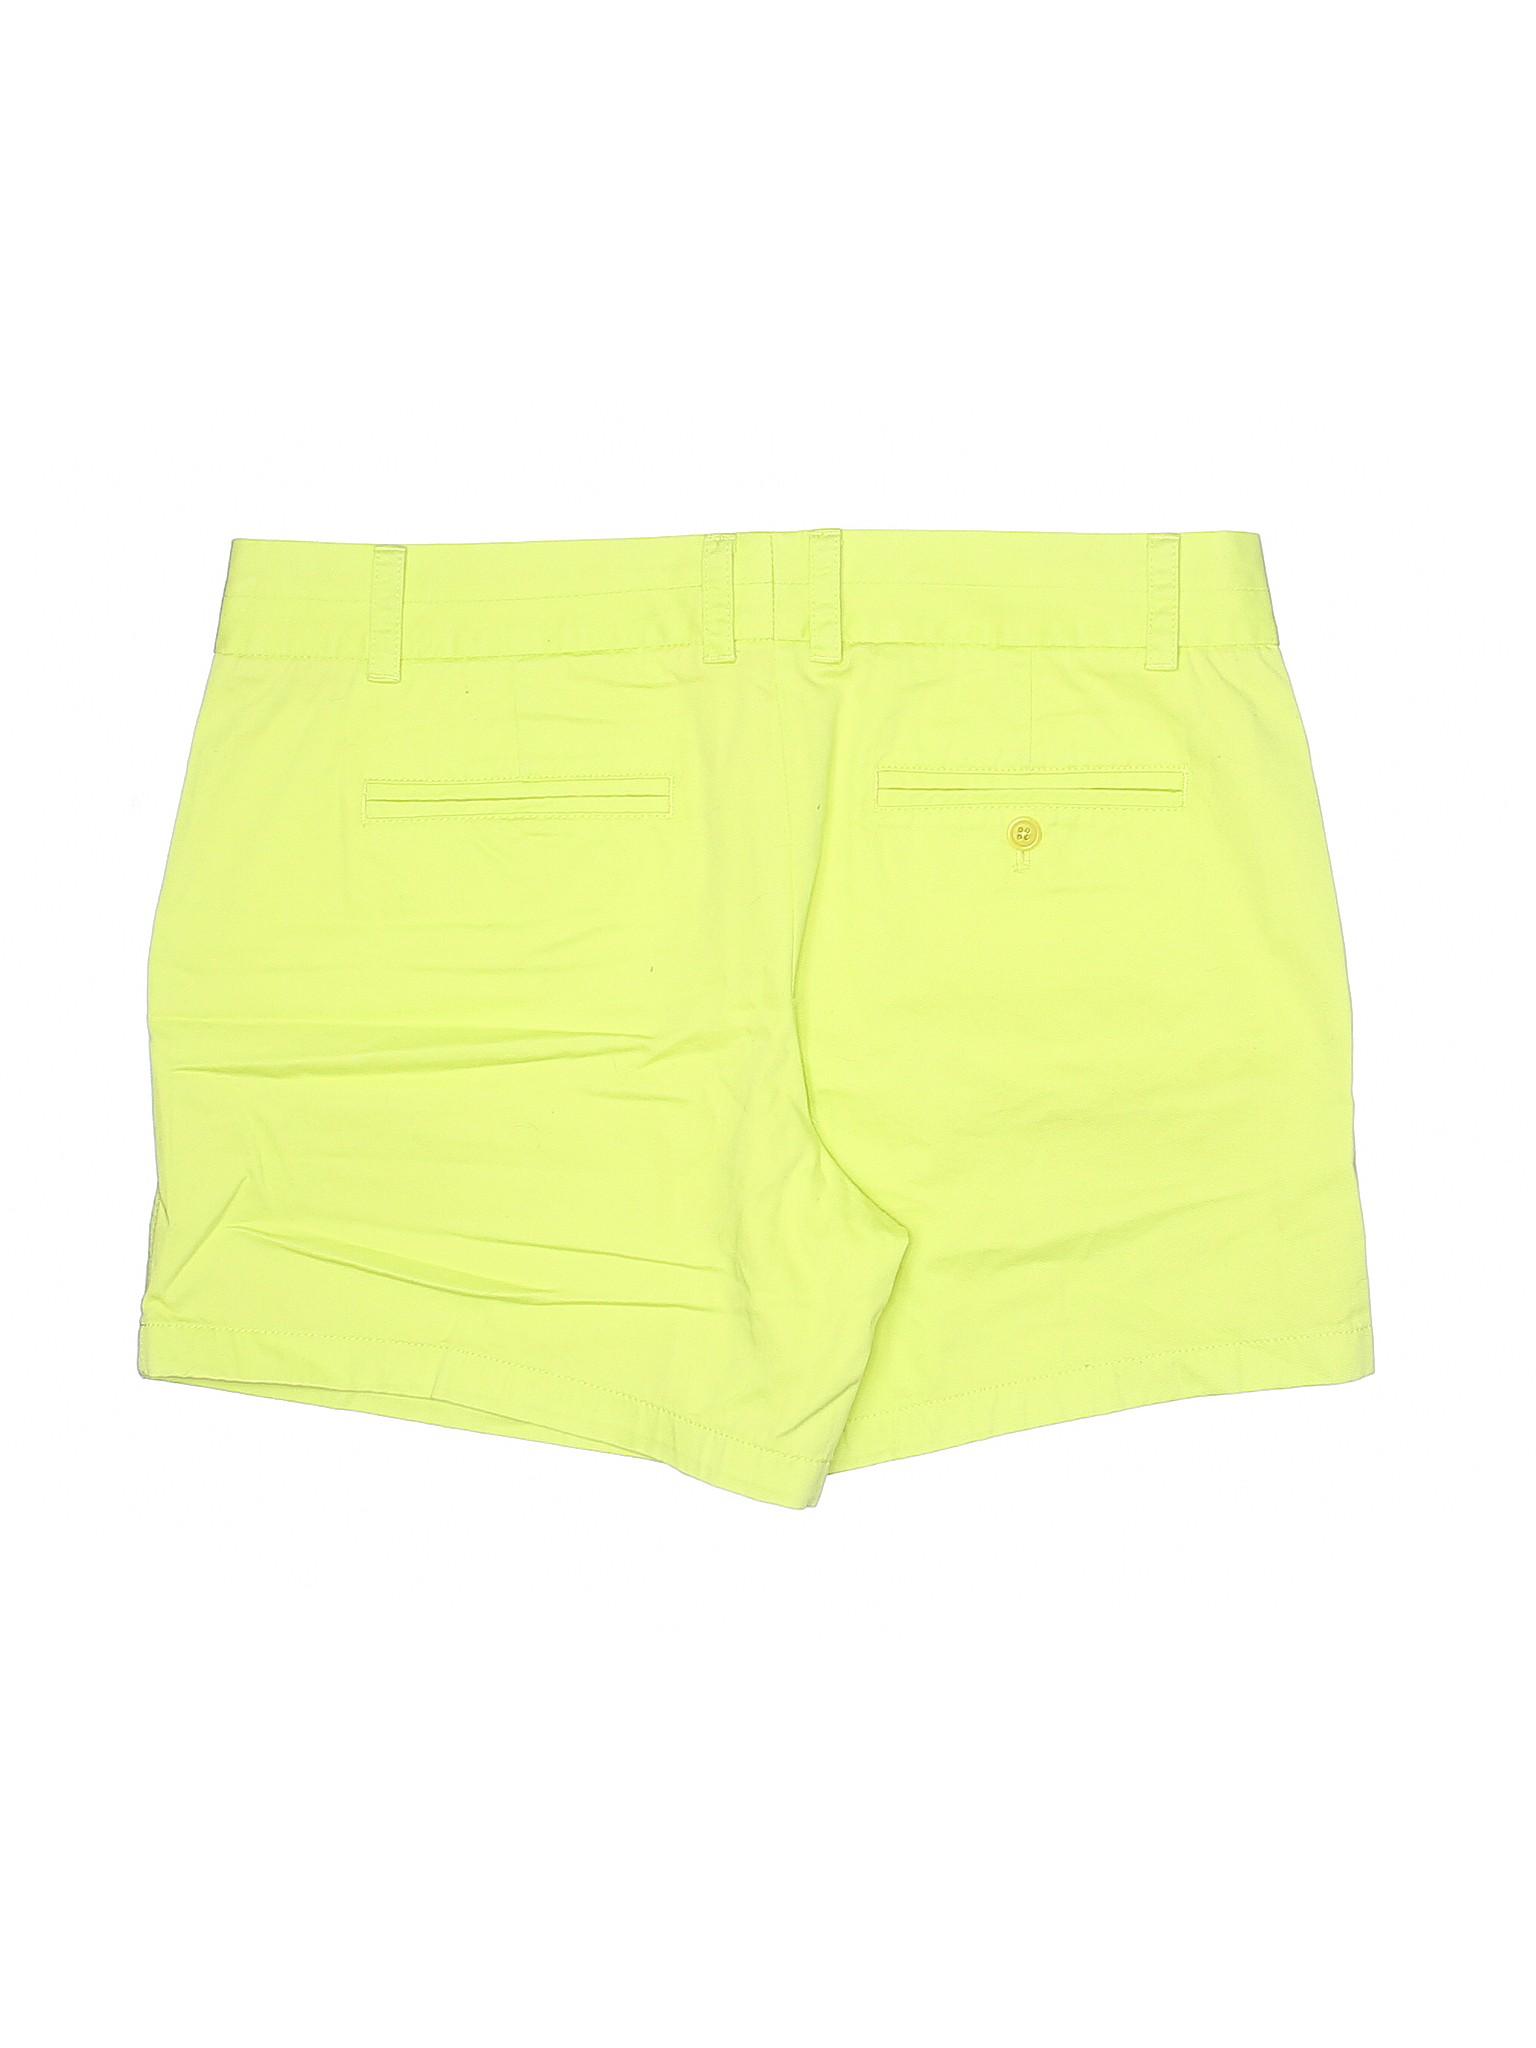 Boutique J Crew J Crew Shorts Khaki Shorts Boutique Khaki rxOCXqrwZ